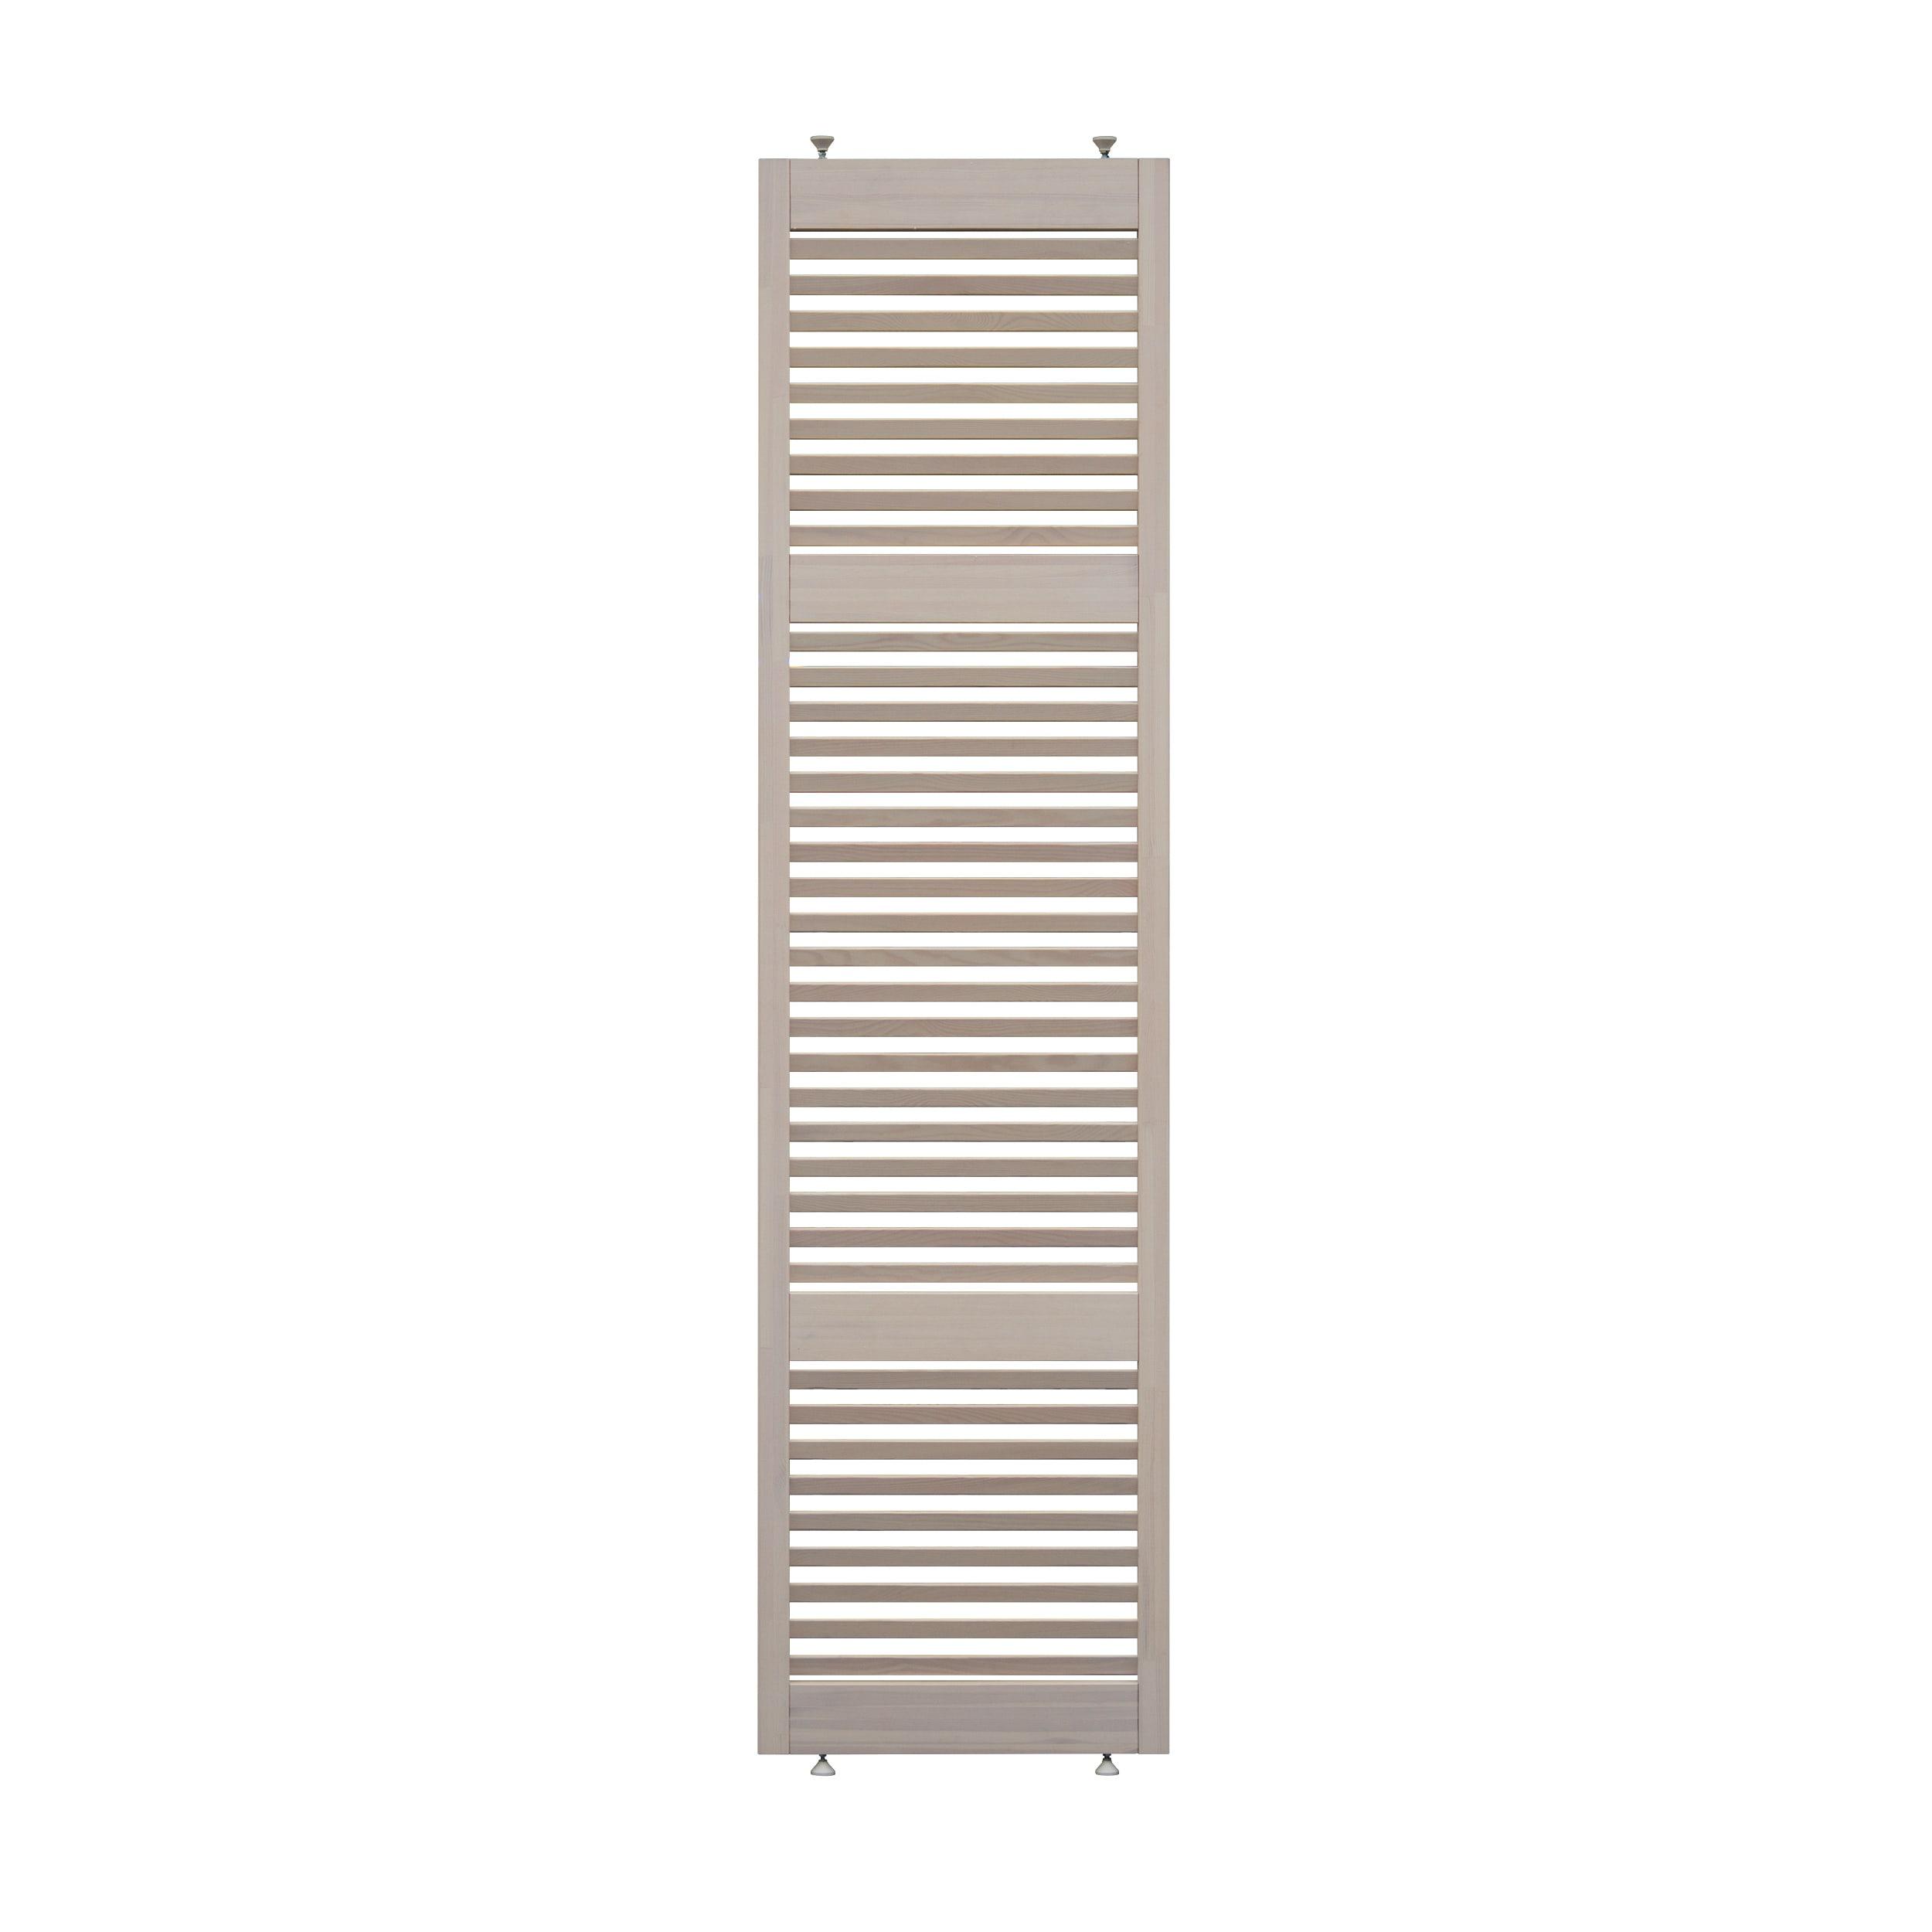 Parete Divisoria In Legno parete divisoria in legno l 66 x h 270 cm sbiancata